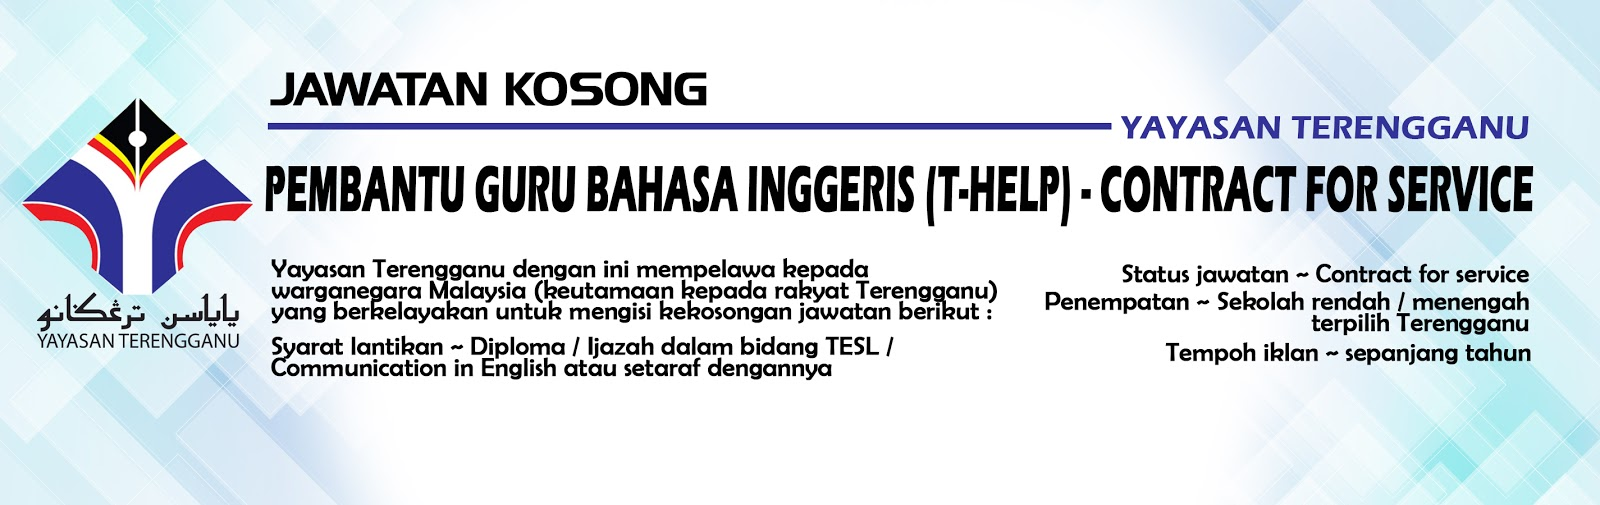 Jawatan Kosong Yayasan Terengganu Terbuka Sepanjang Tahun Jawatan Kosong Kerajaan 2020 Terkini